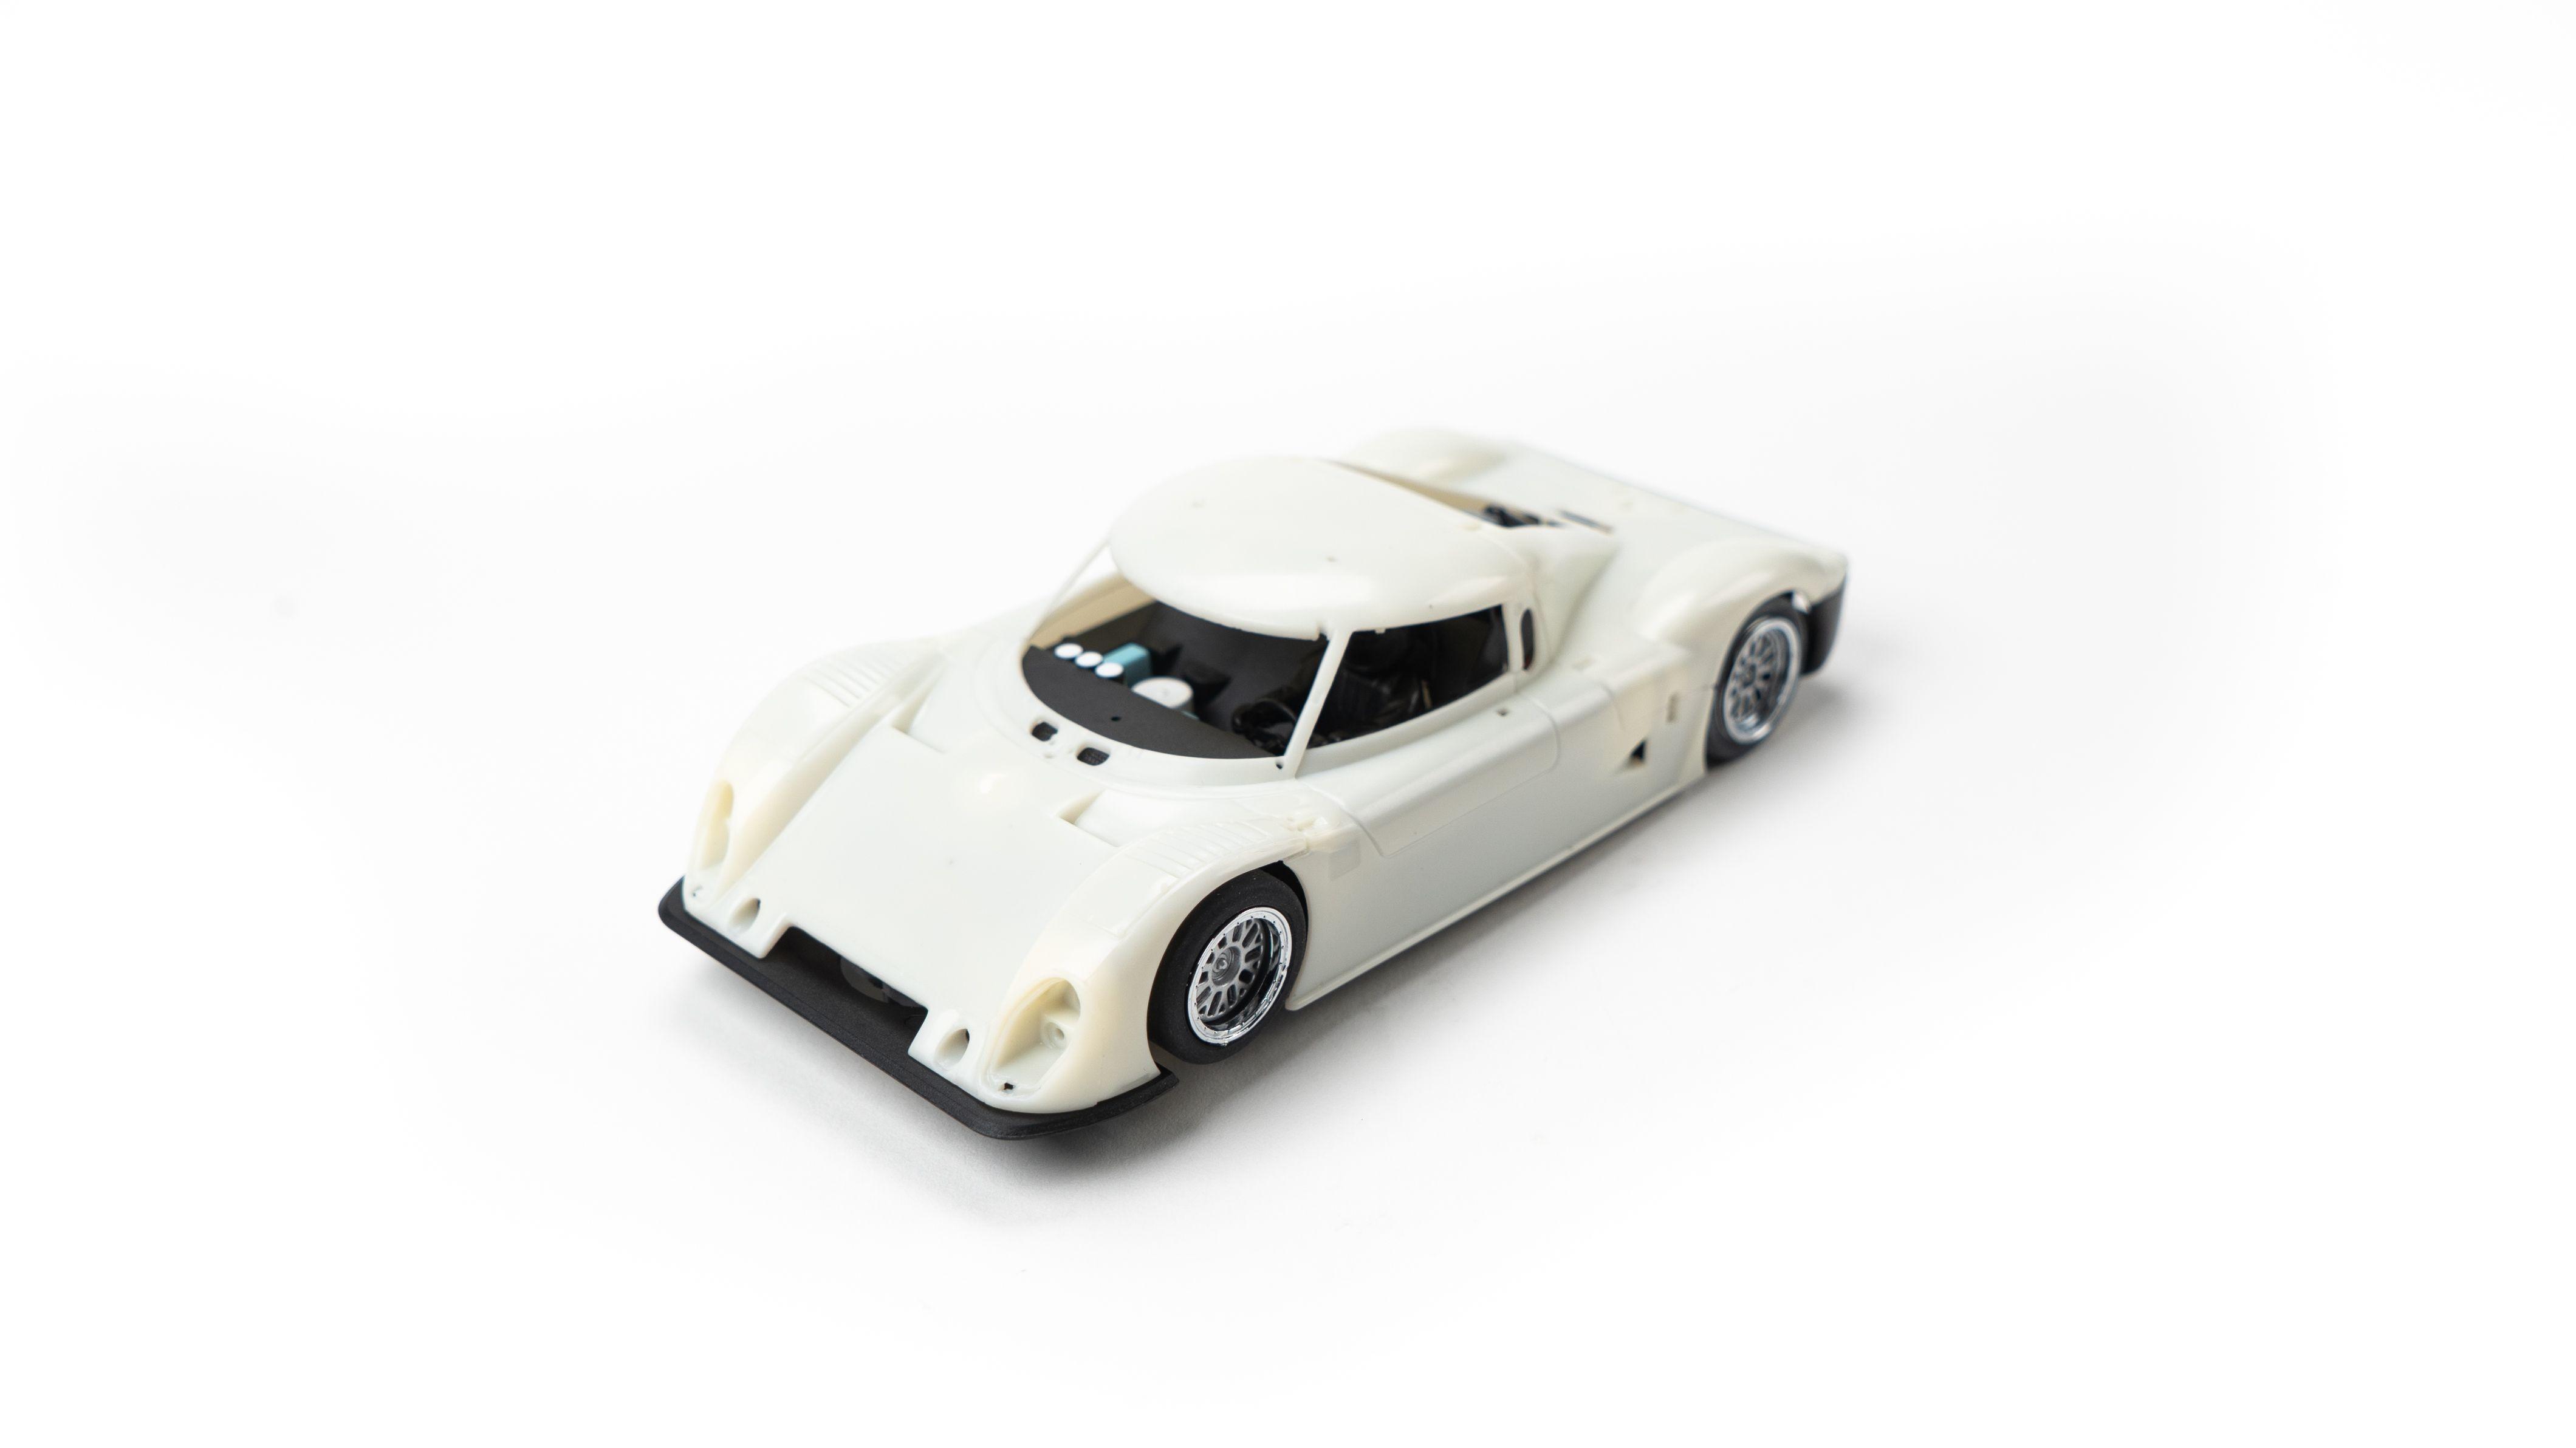 Racer Sideways Riley MKXX Unpainted White Kit Slot Car 1//32